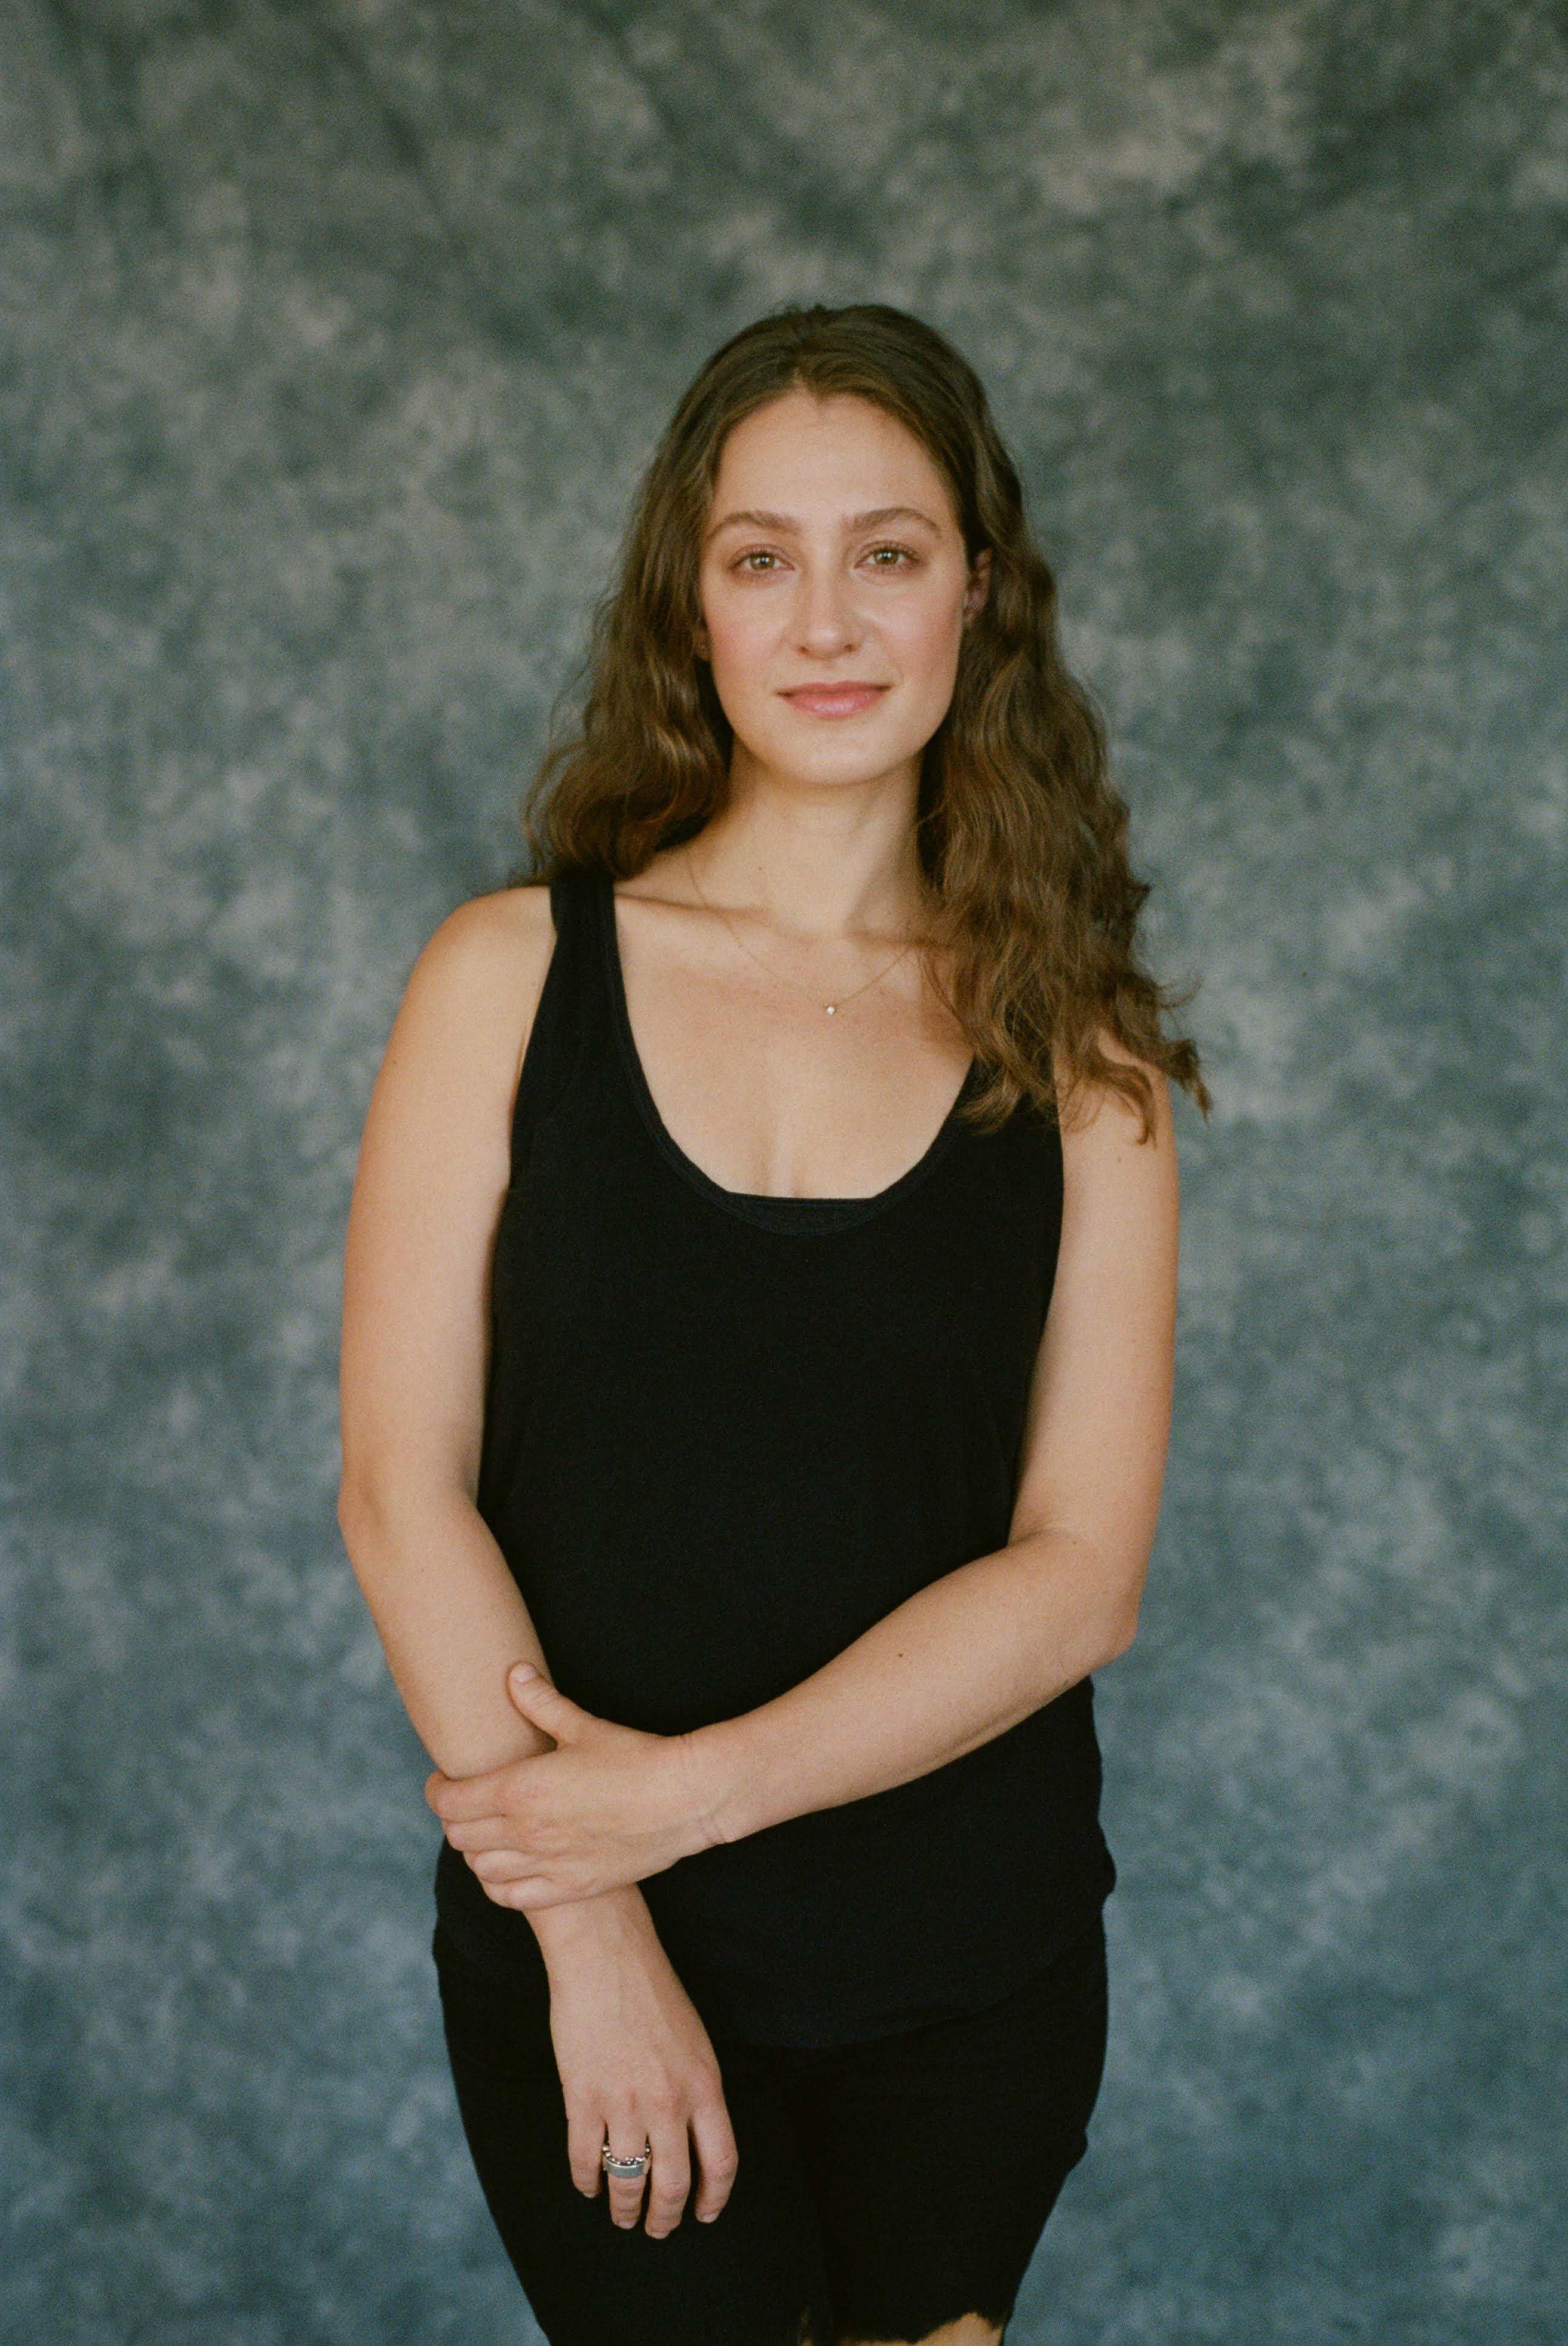 Victoria Manganiello portrait photograph